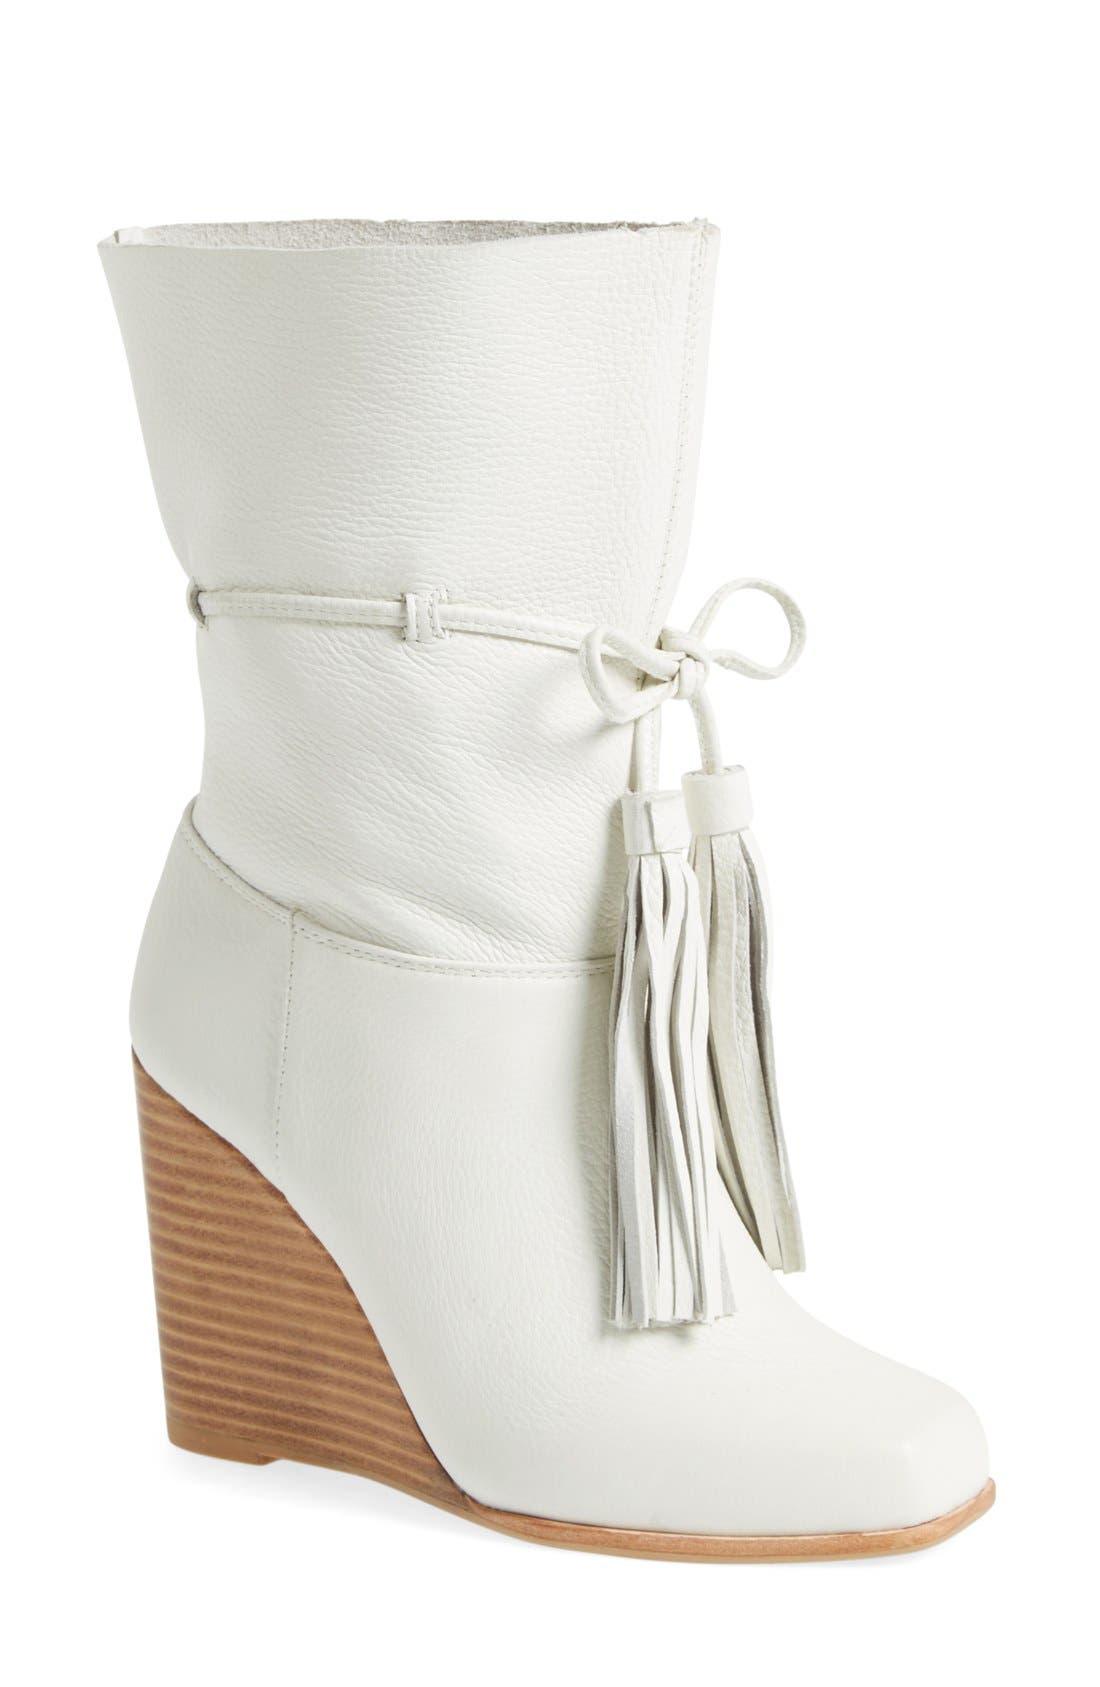 Main Image - Jeffrey Campbell 'Larusso' Wedge Tassel Boot (Women)